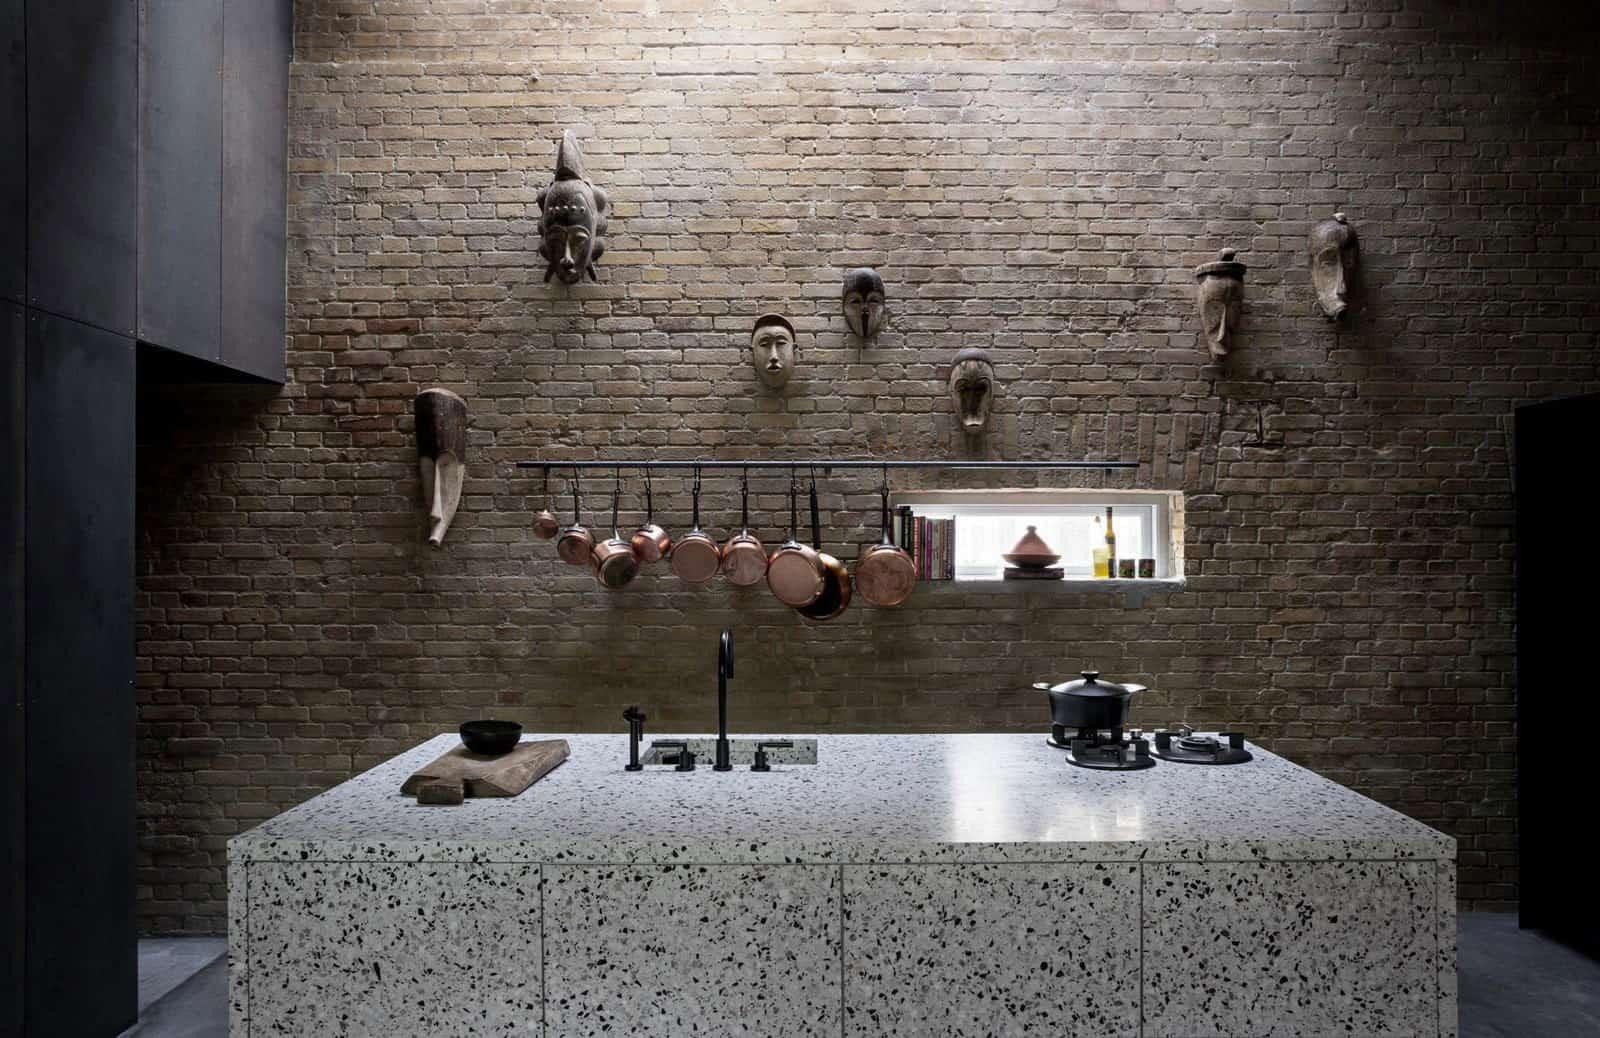 Studio David Thulstrup Renovates a Private Residence for a Photographer in Copenhagen